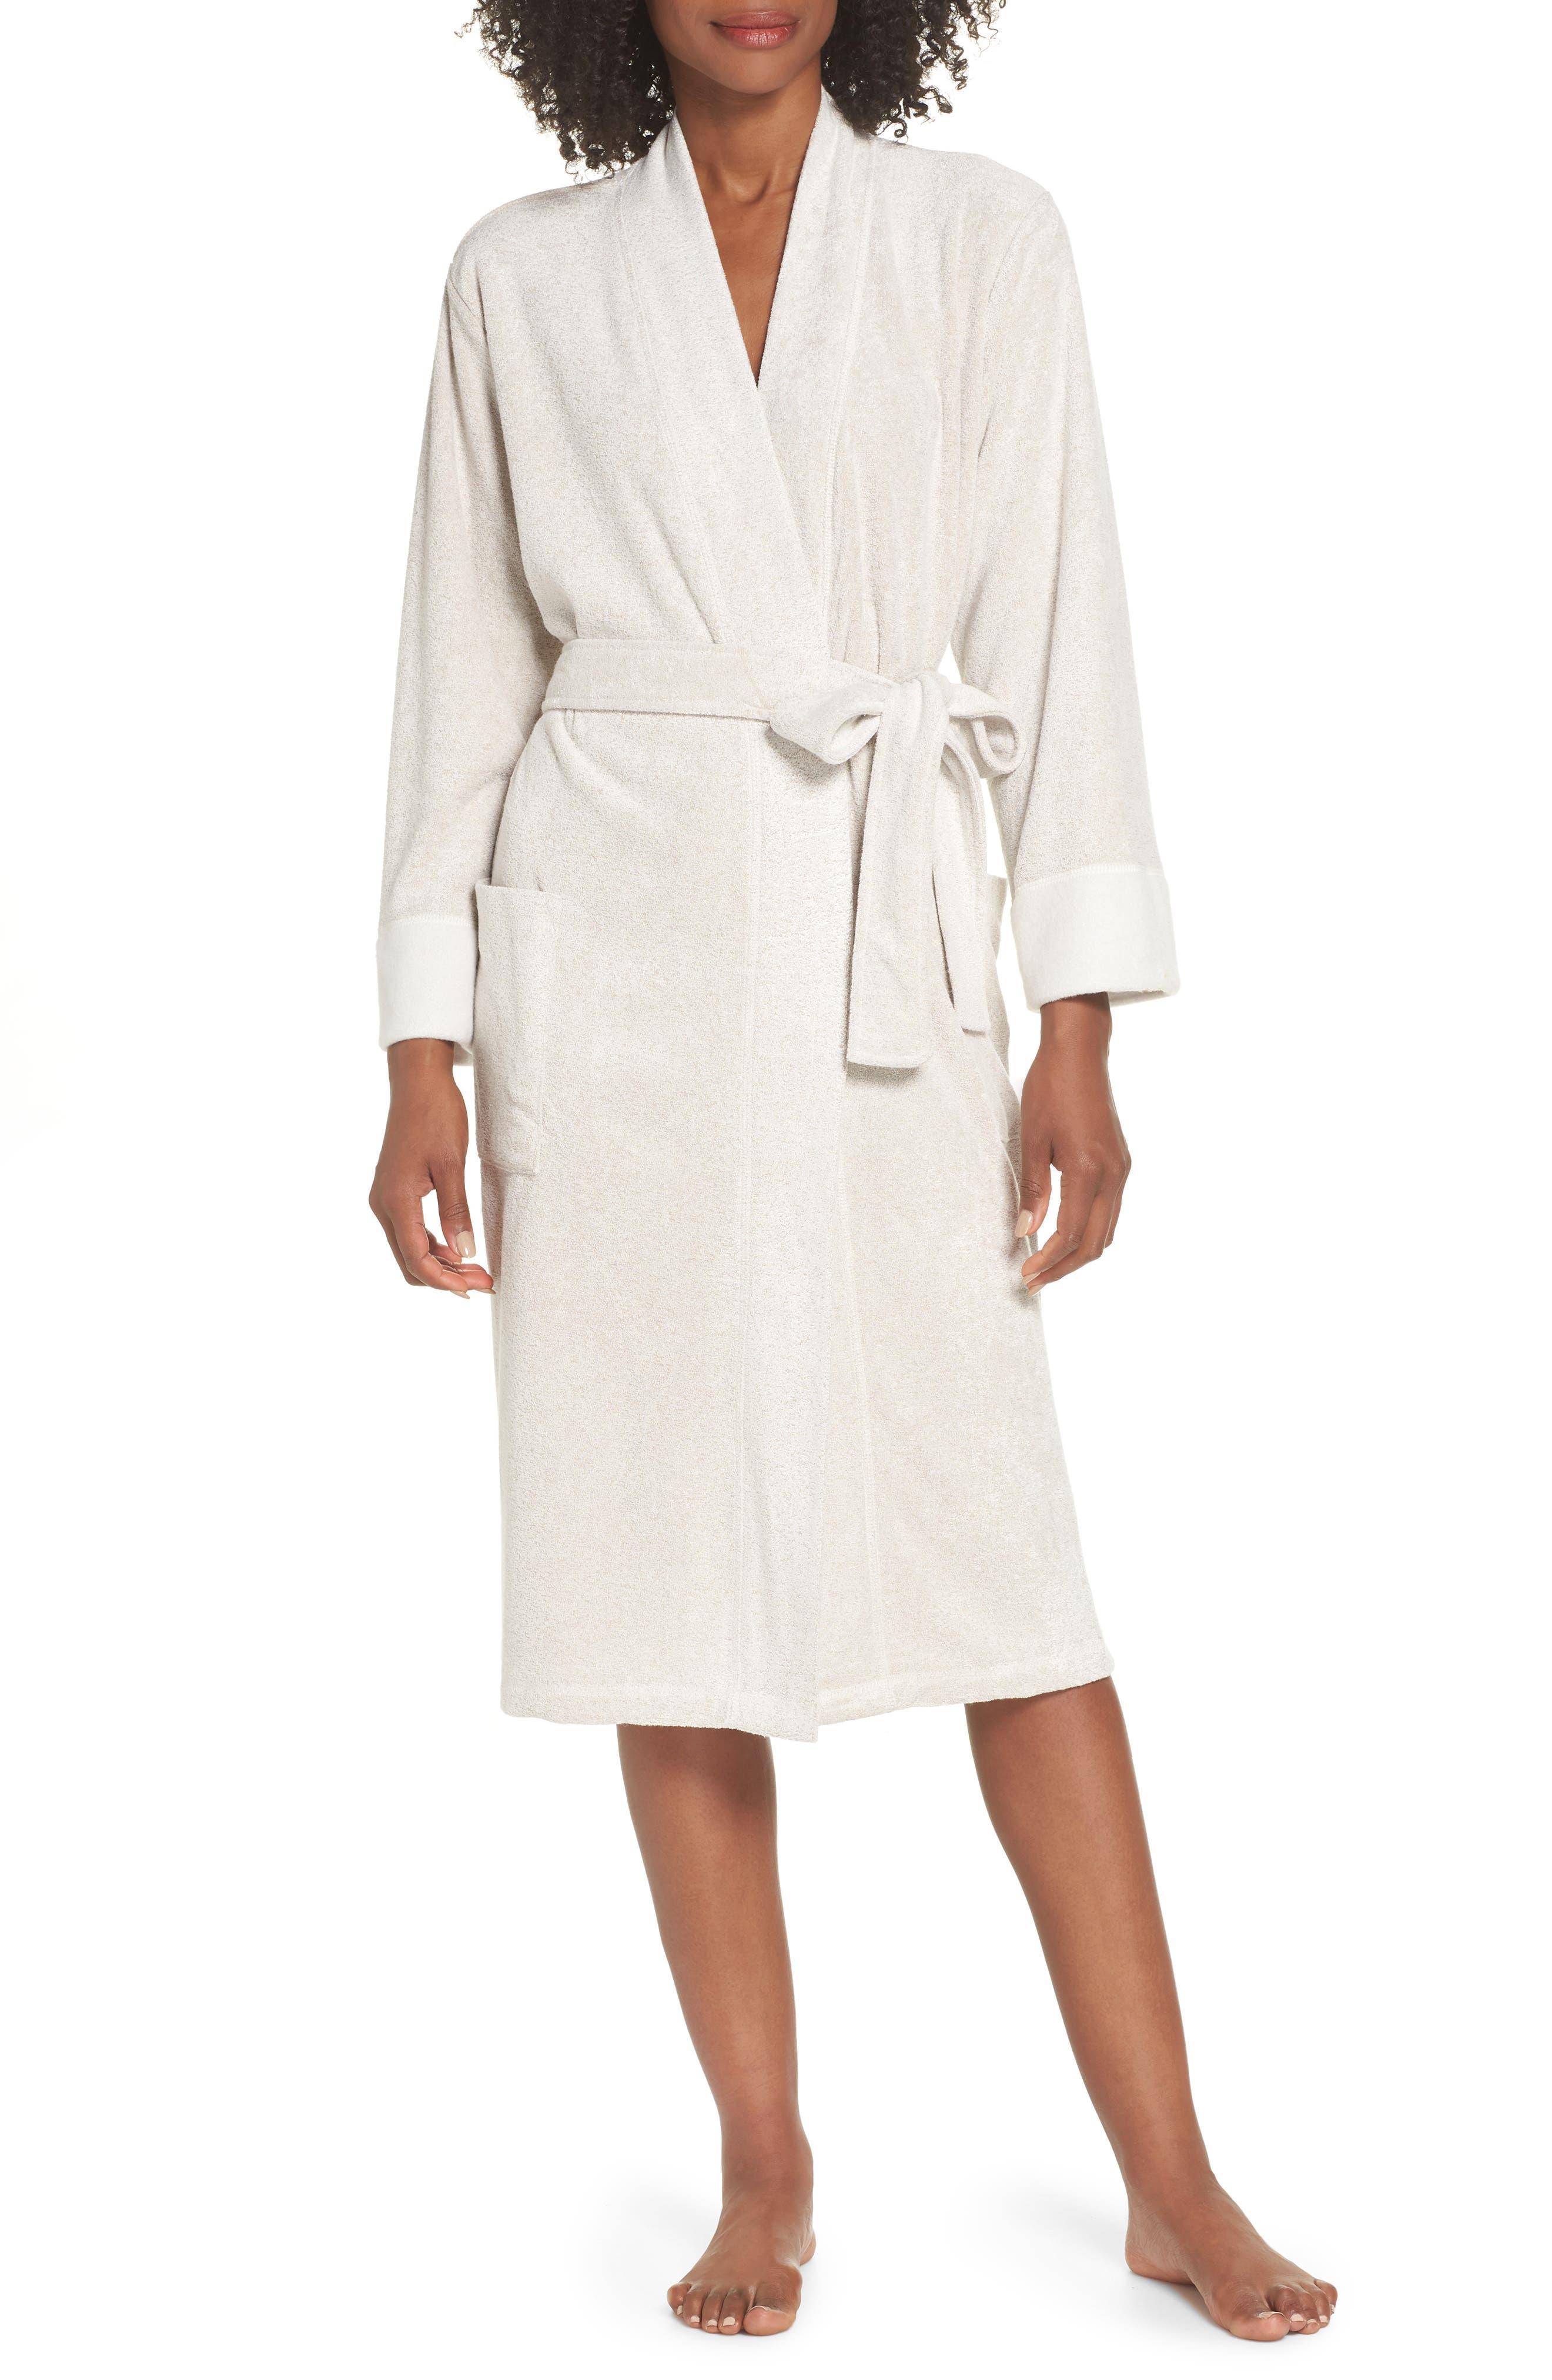 NATORI 'Nirvana' Midi Robe, Main, color, 273